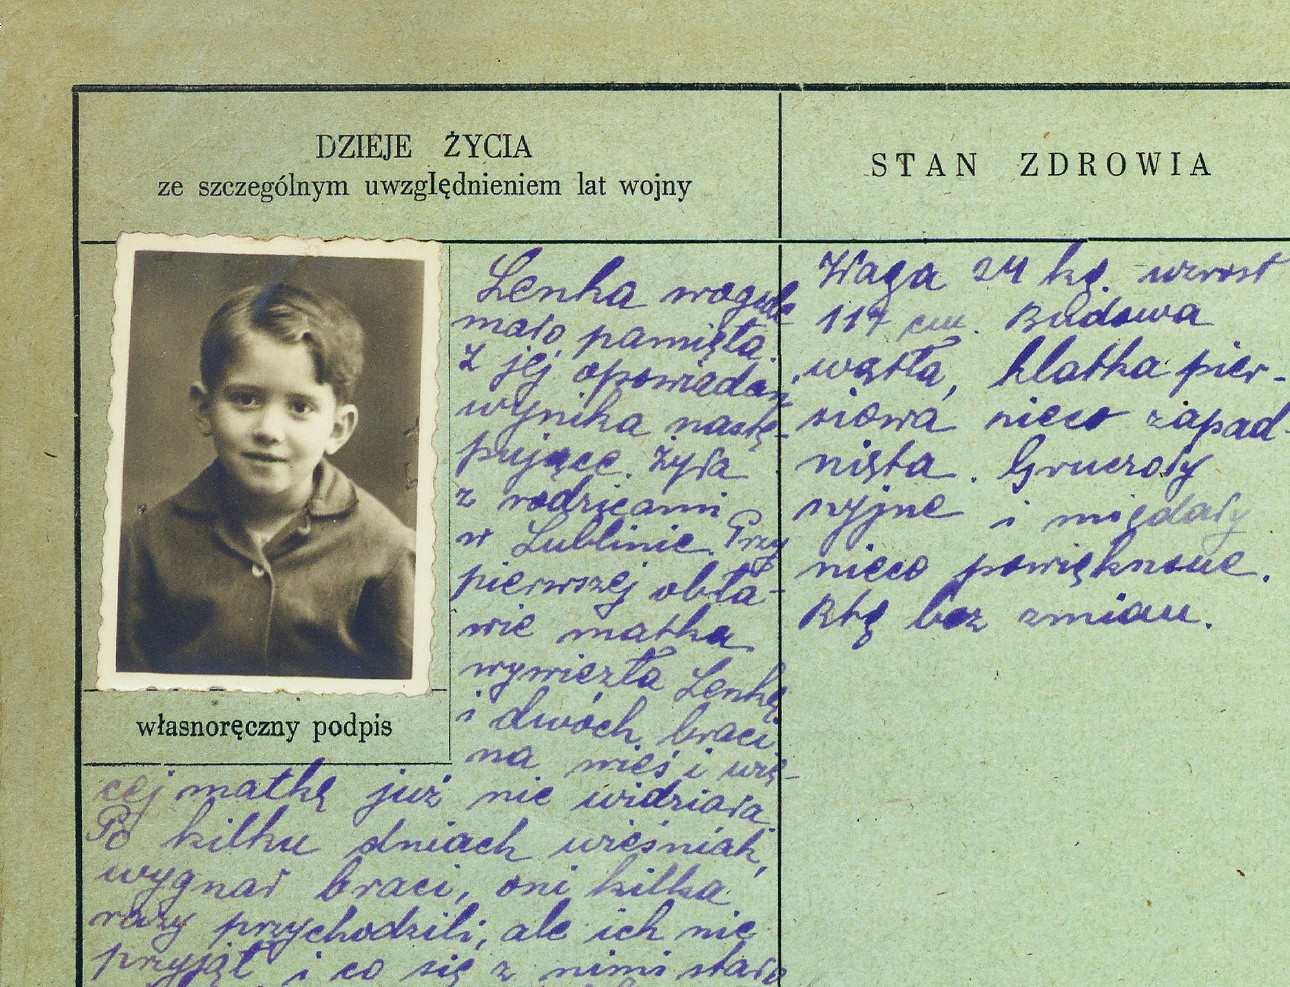 2021-05-30-lena-dziecko-holocaustu.jpg